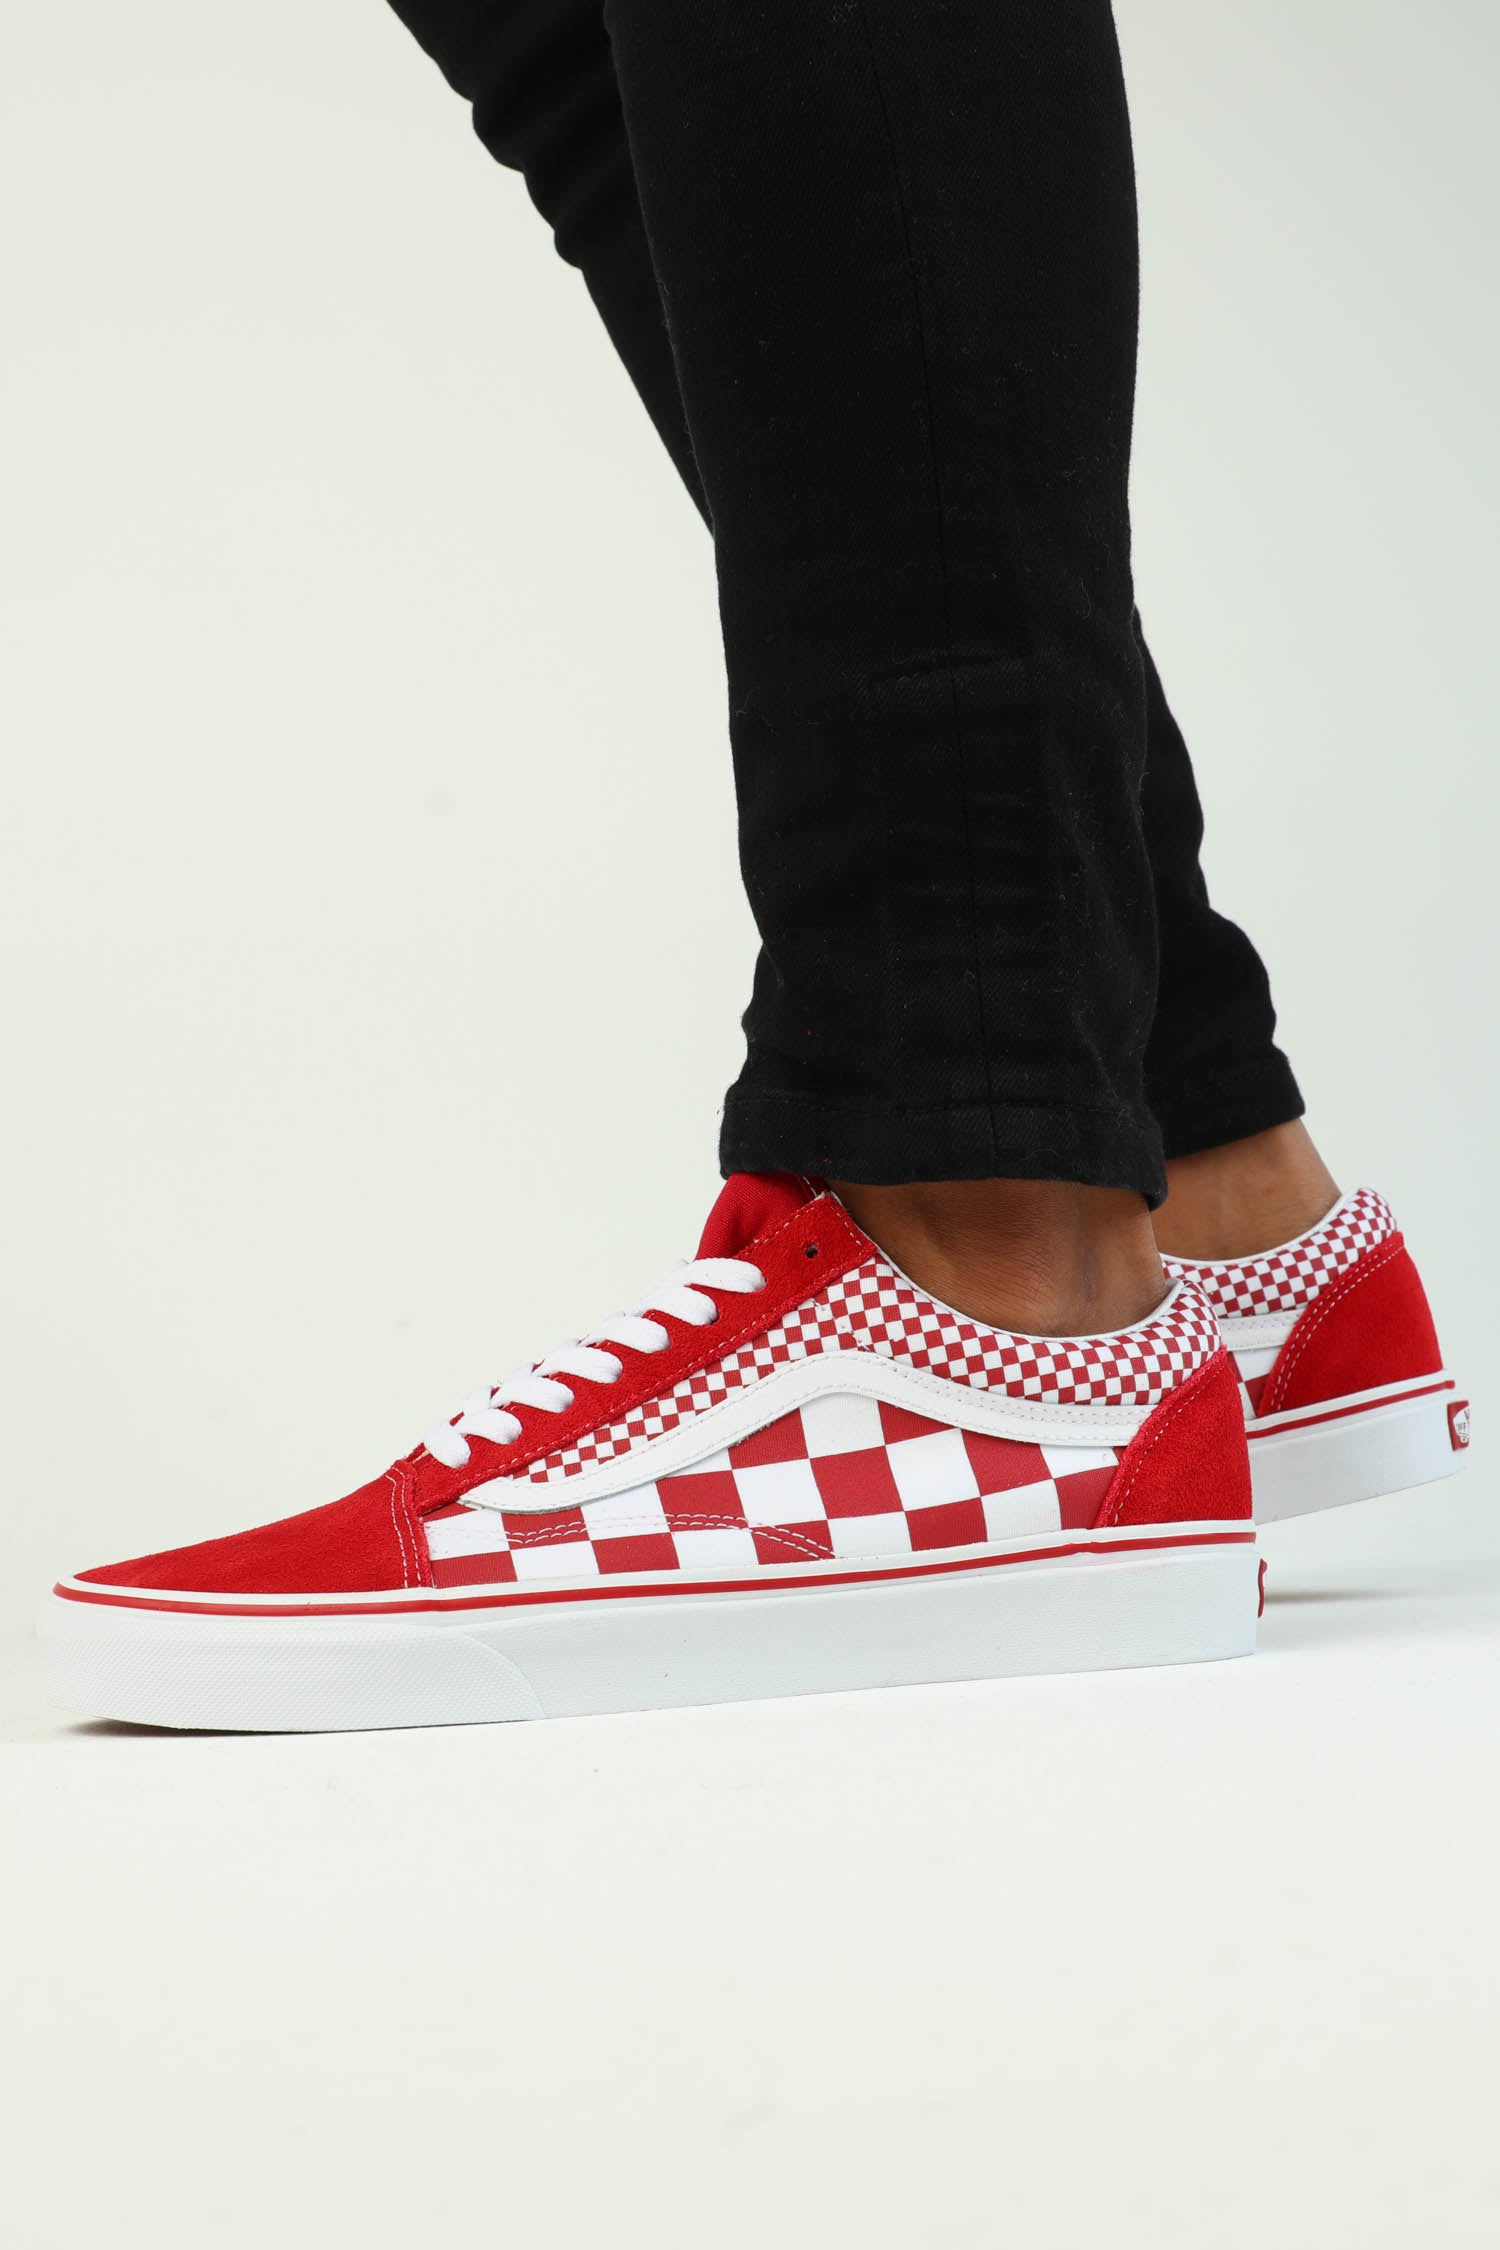 Vans Old Skool (Mix Checker) Red/White